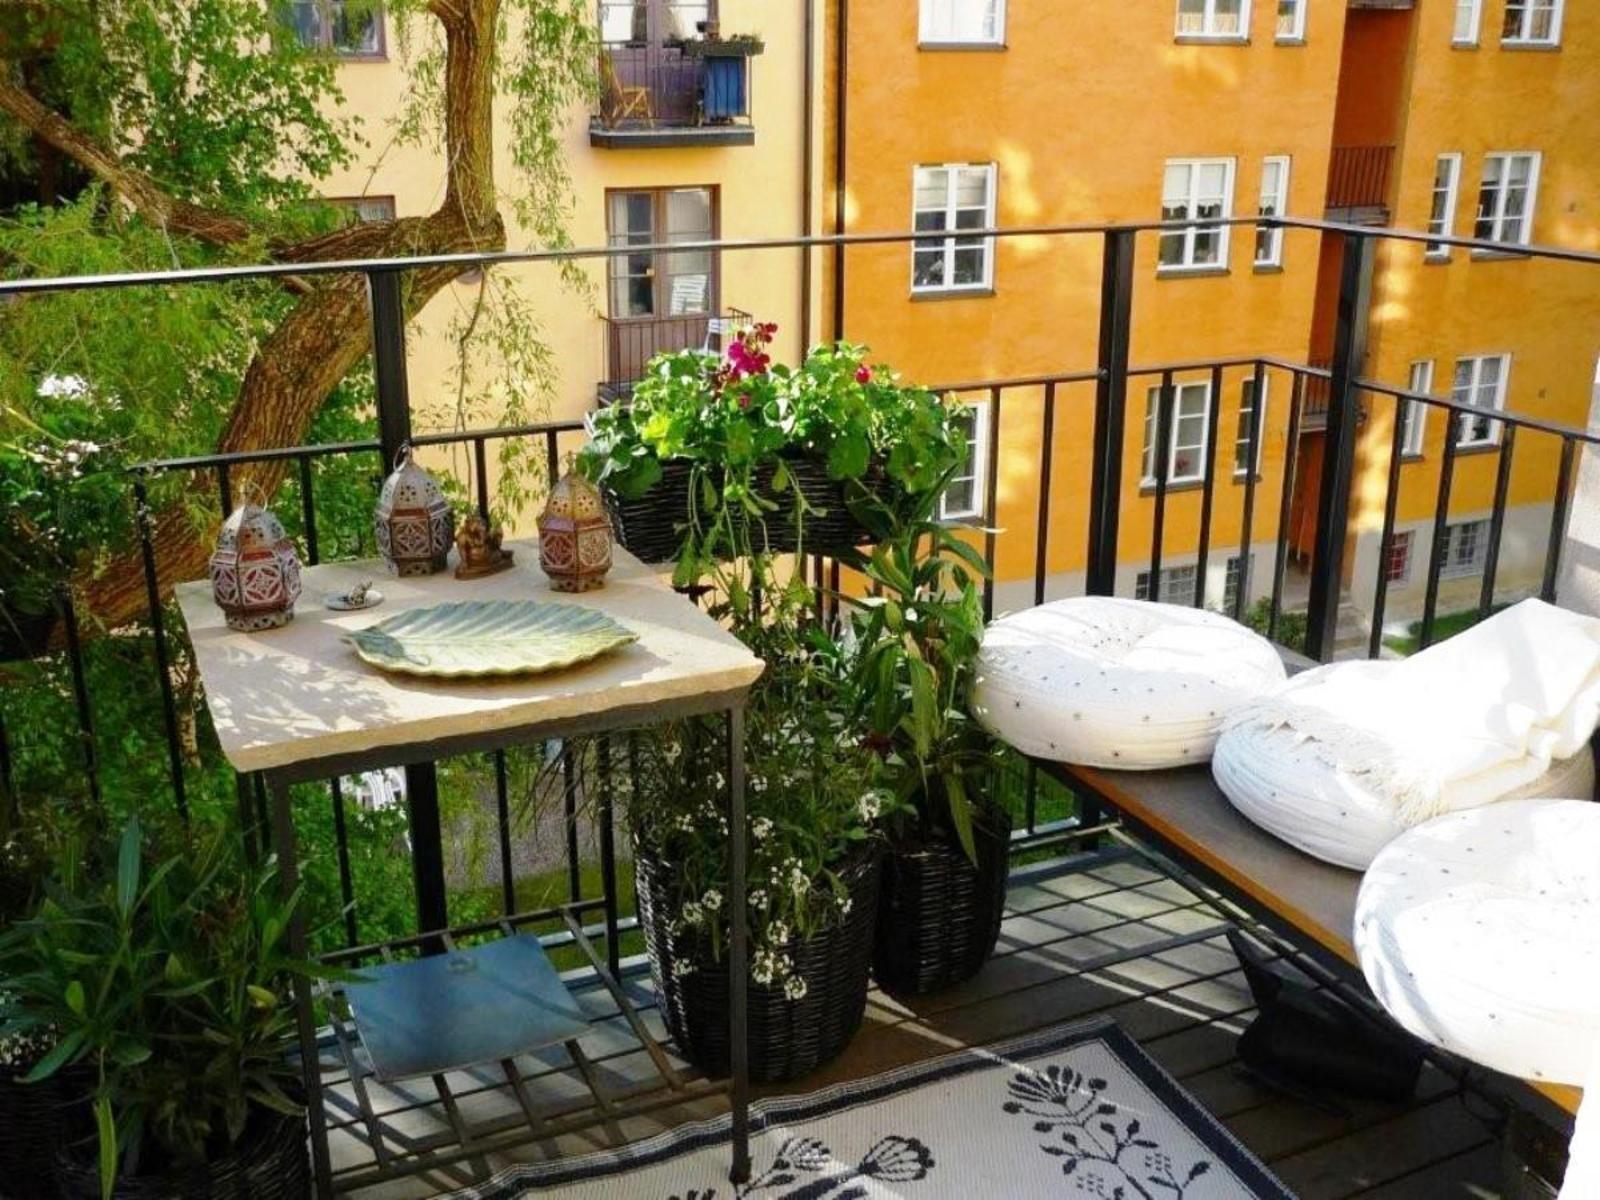 small apartment patio decorating ideas. Original_tegels-hout-balkon.jpg (1600×1200) Small Apartment Patio Decorating Ideas I